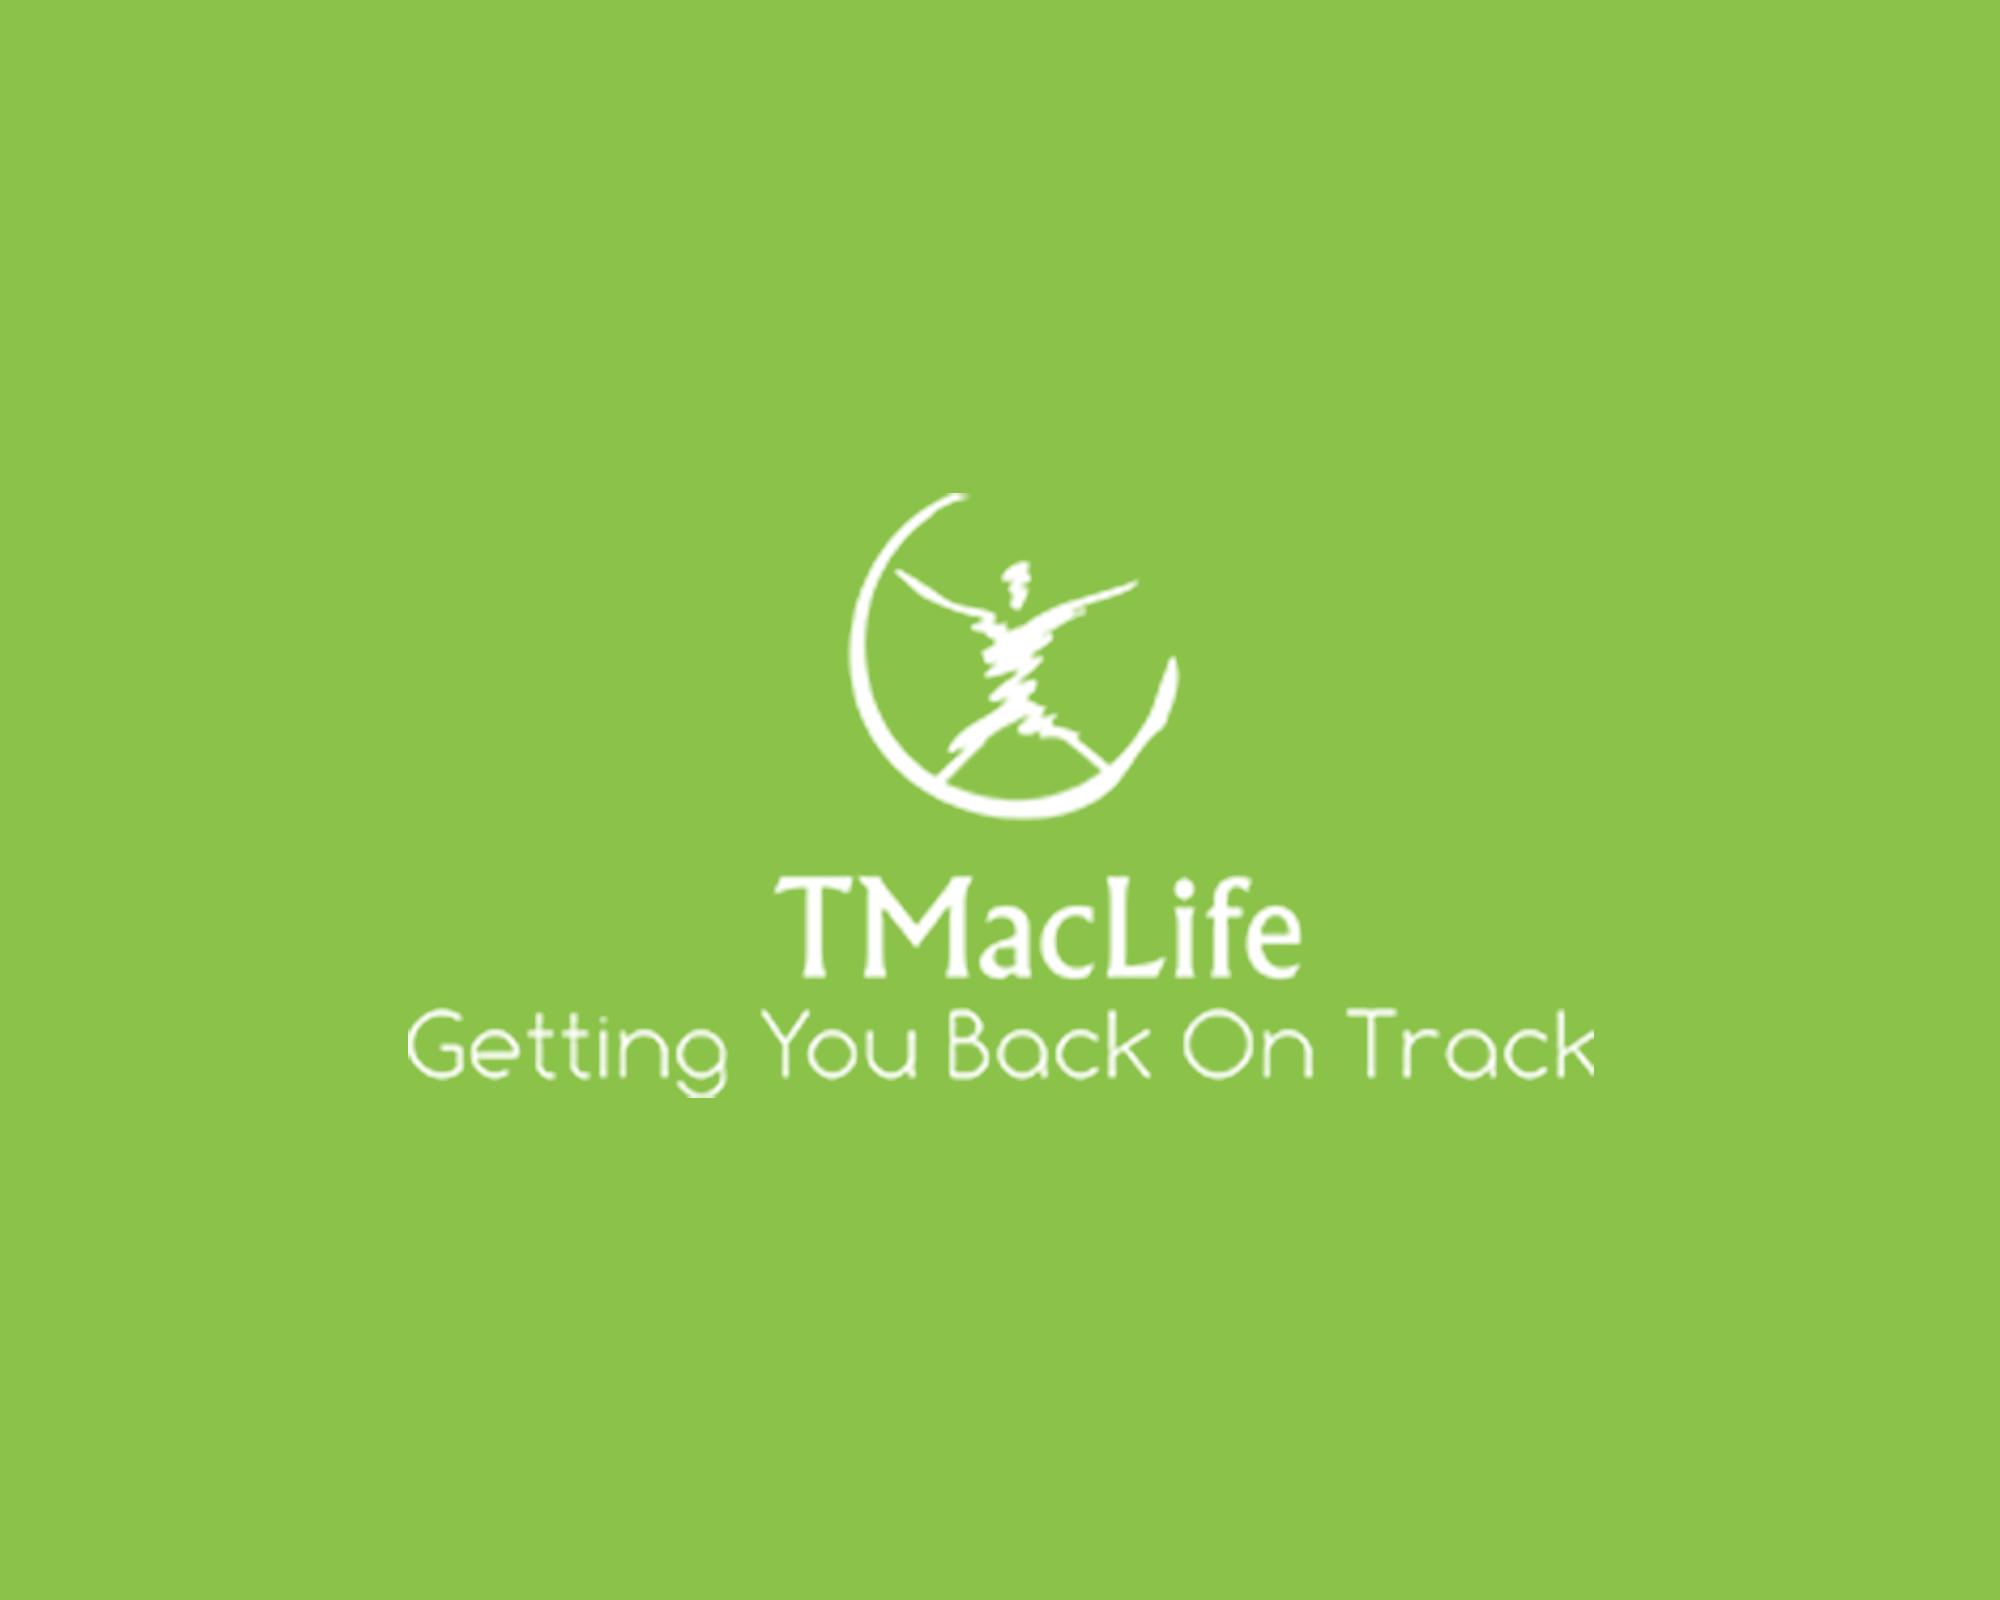 tmac life Logo